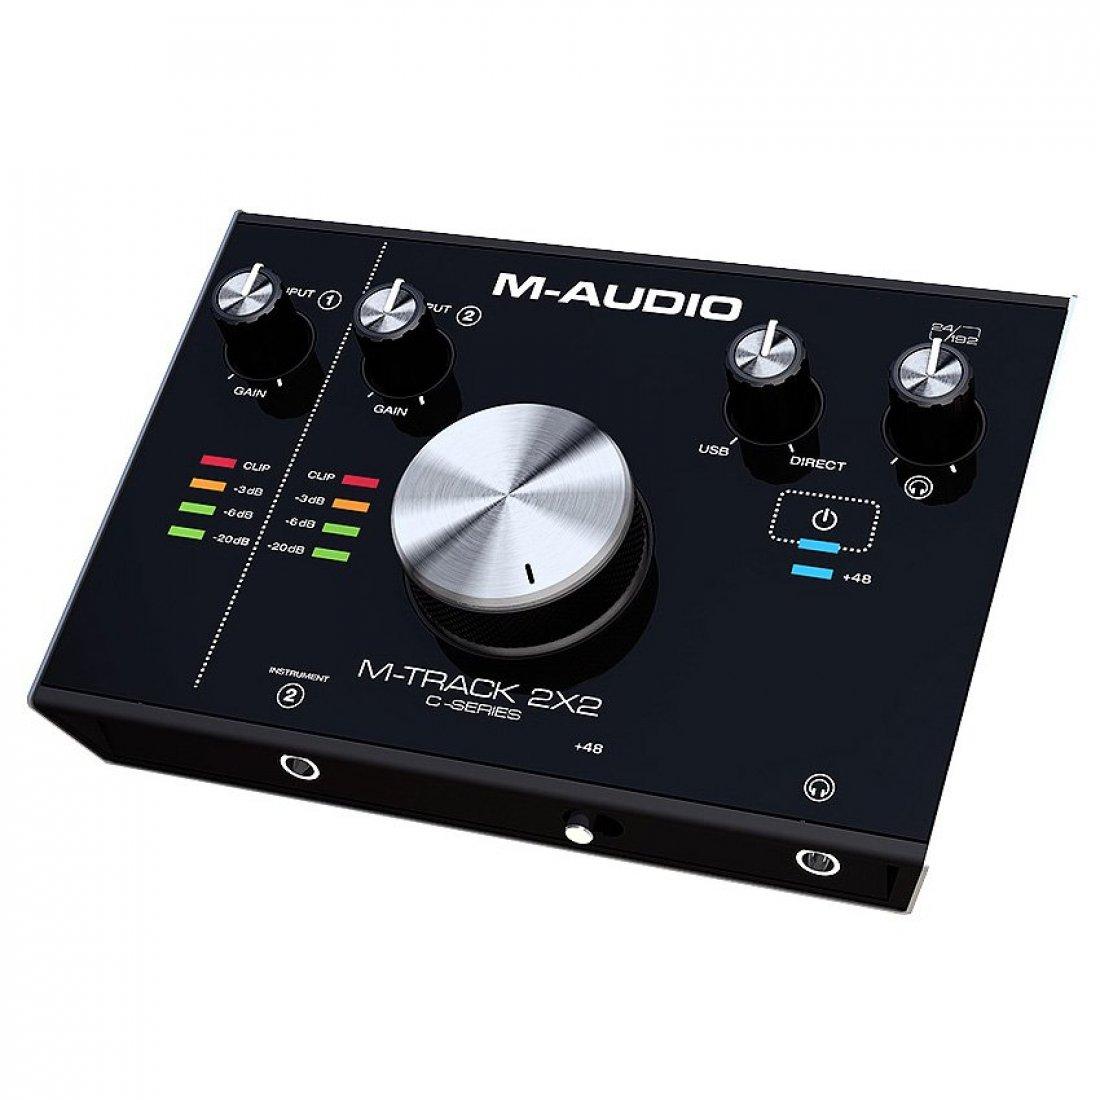 M - Audio M - Track 2x2 Interface de Audio USB, 2 Entrdas, 2 Saidas